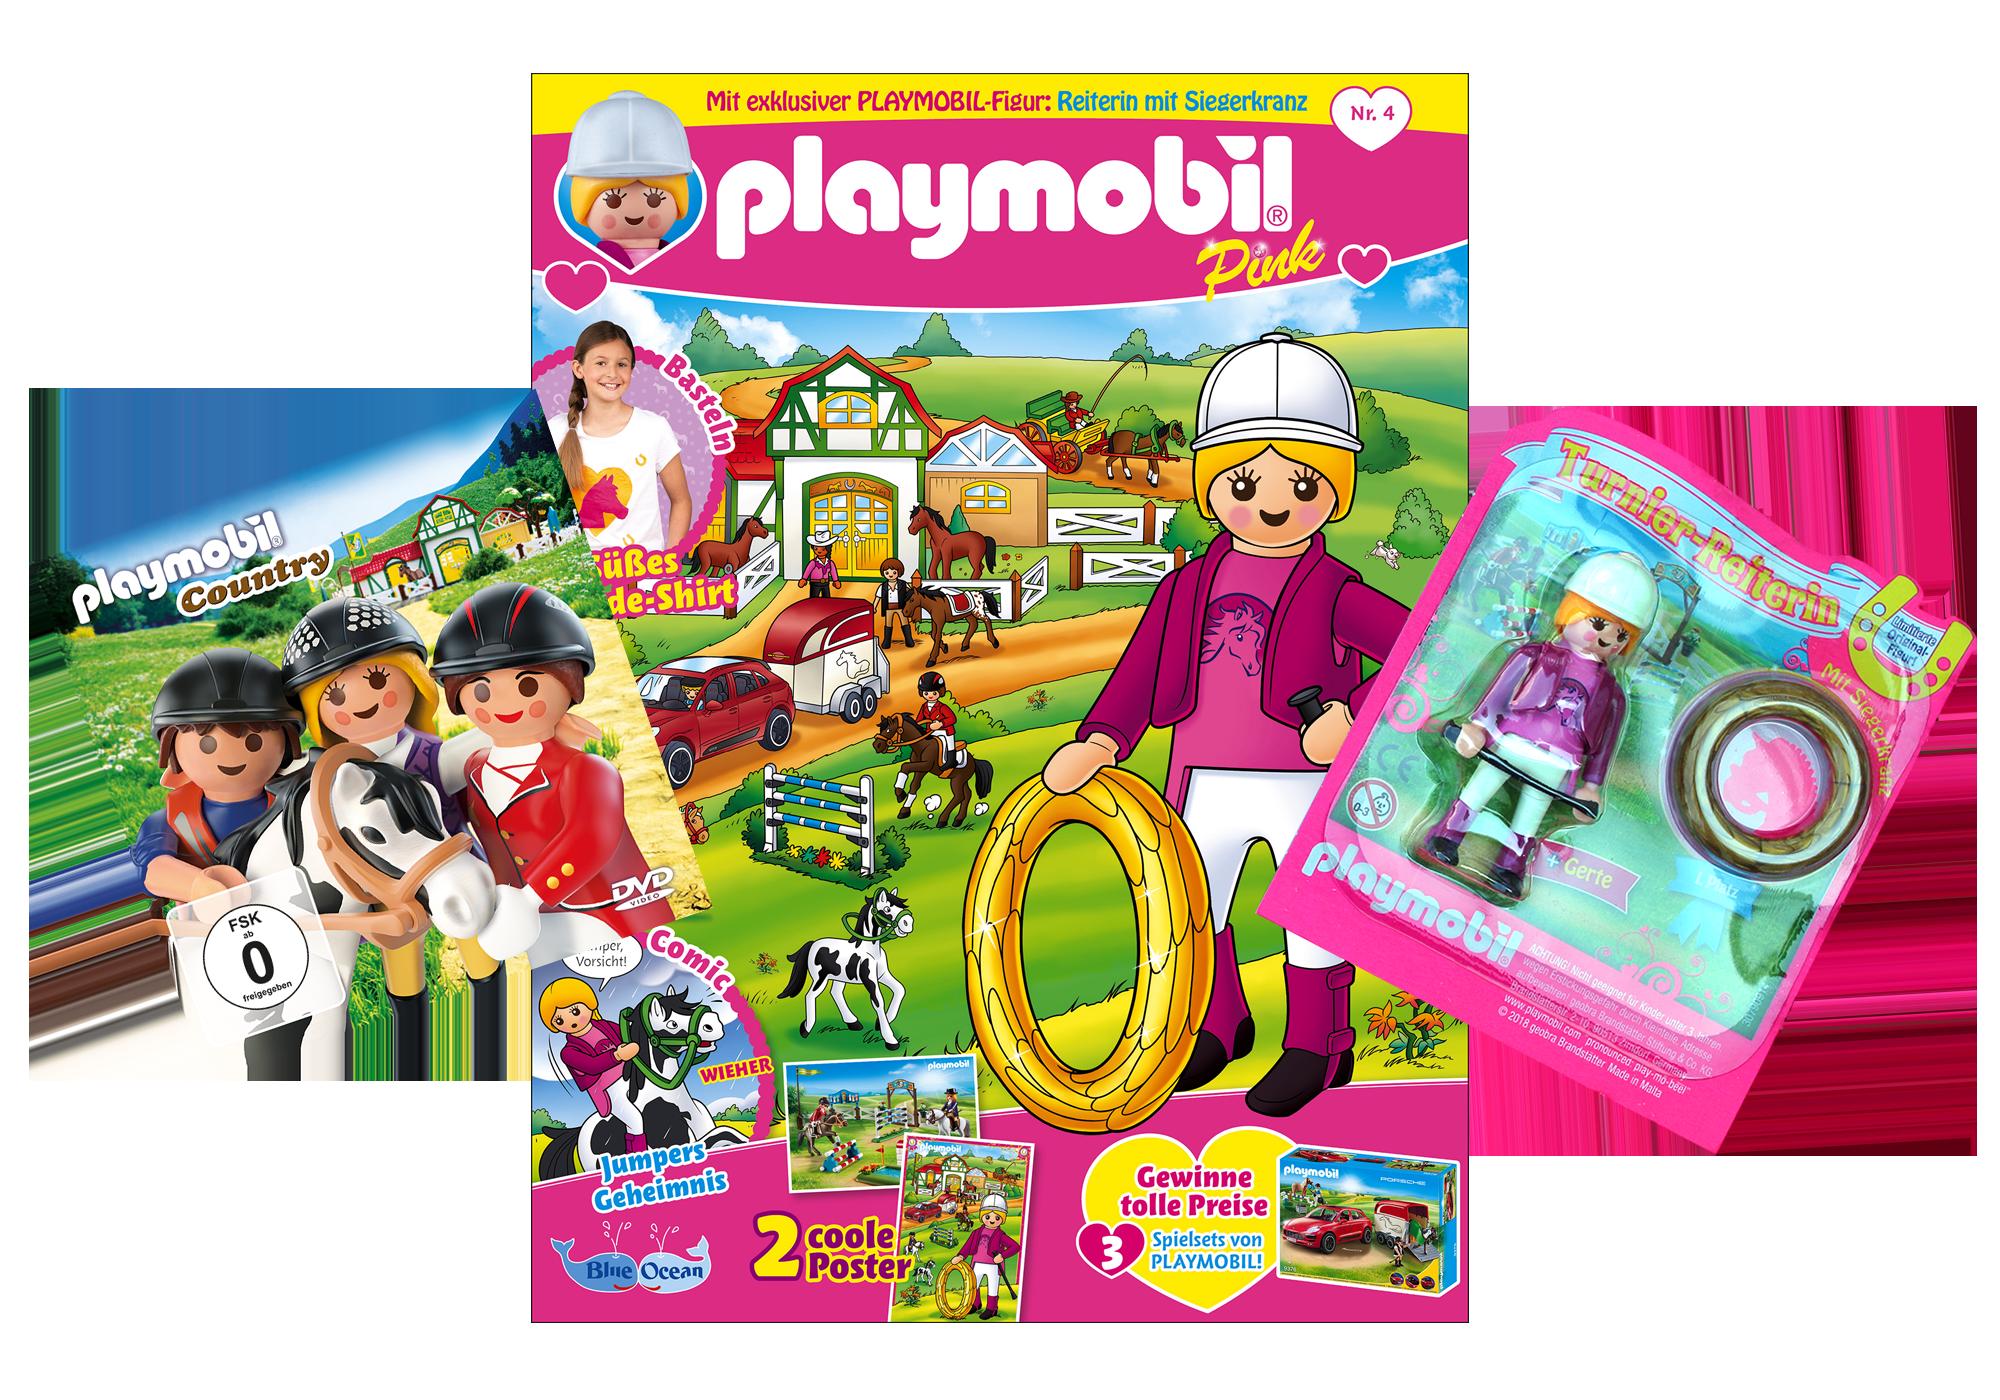 http://media.playmobil.com/i/playmobil/80608_product_detail/PLAYMOBIL-Magazin Pink 4/2018 (Heft 36)